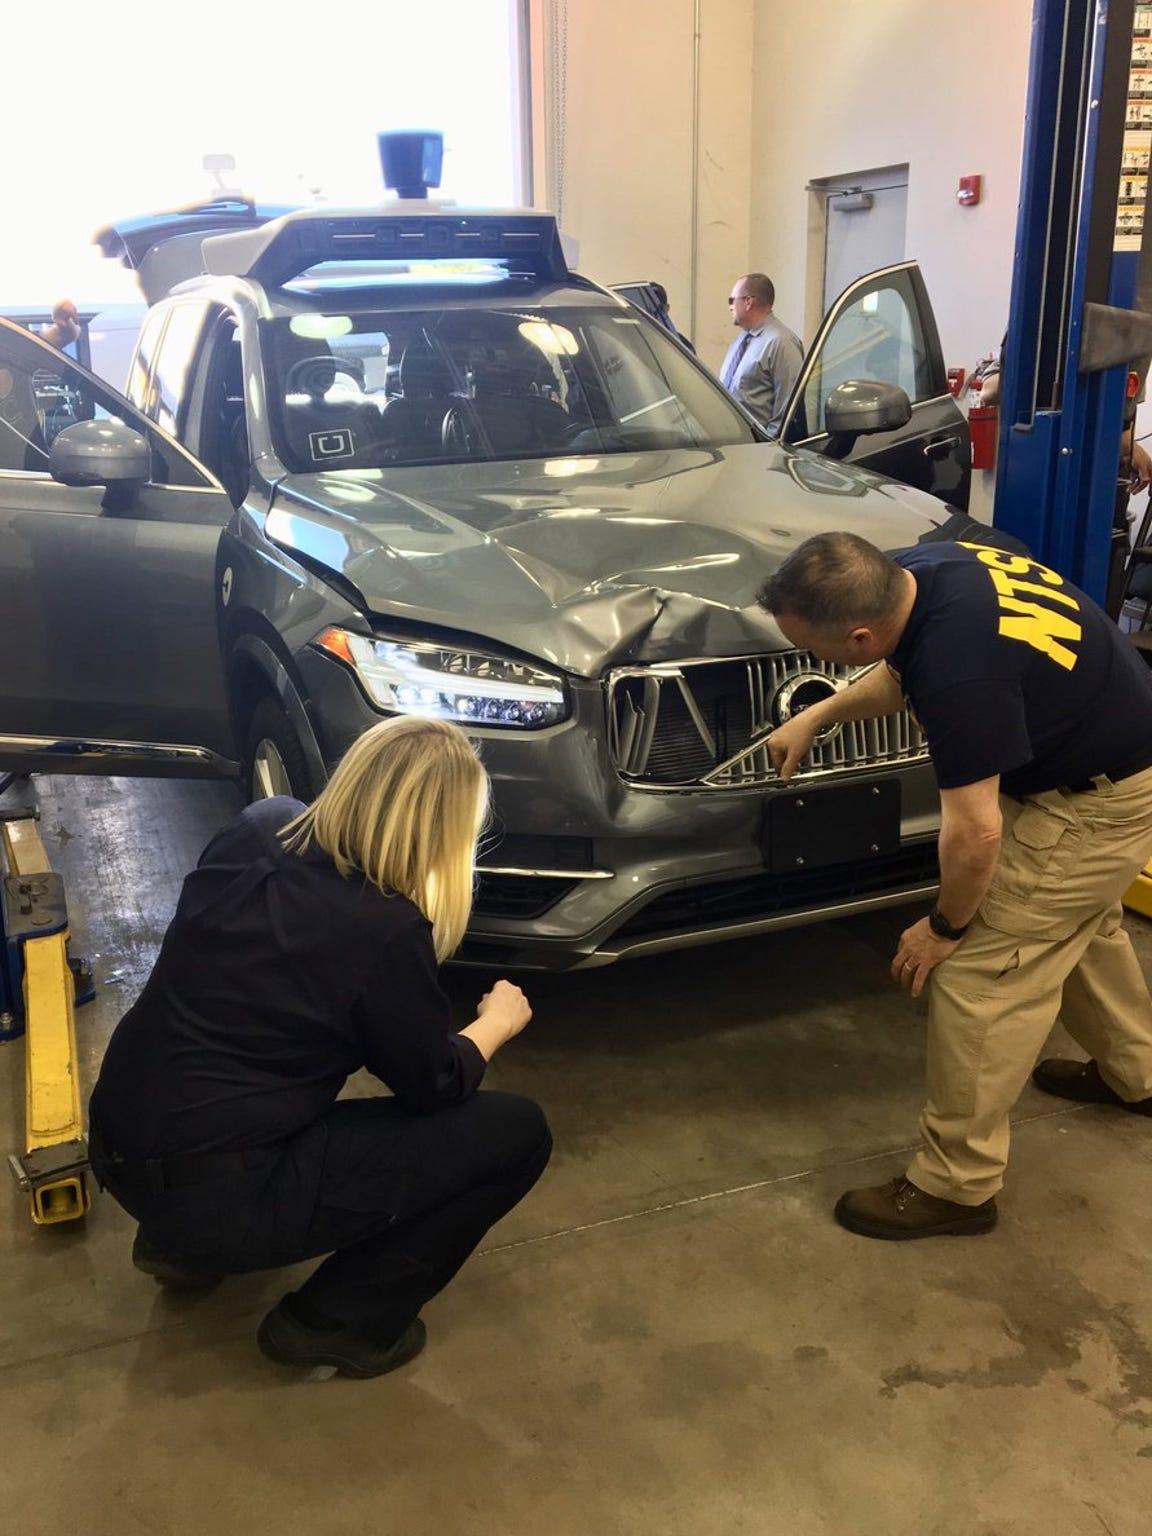 NTSB investigators examine a self-driving Uber vehicle